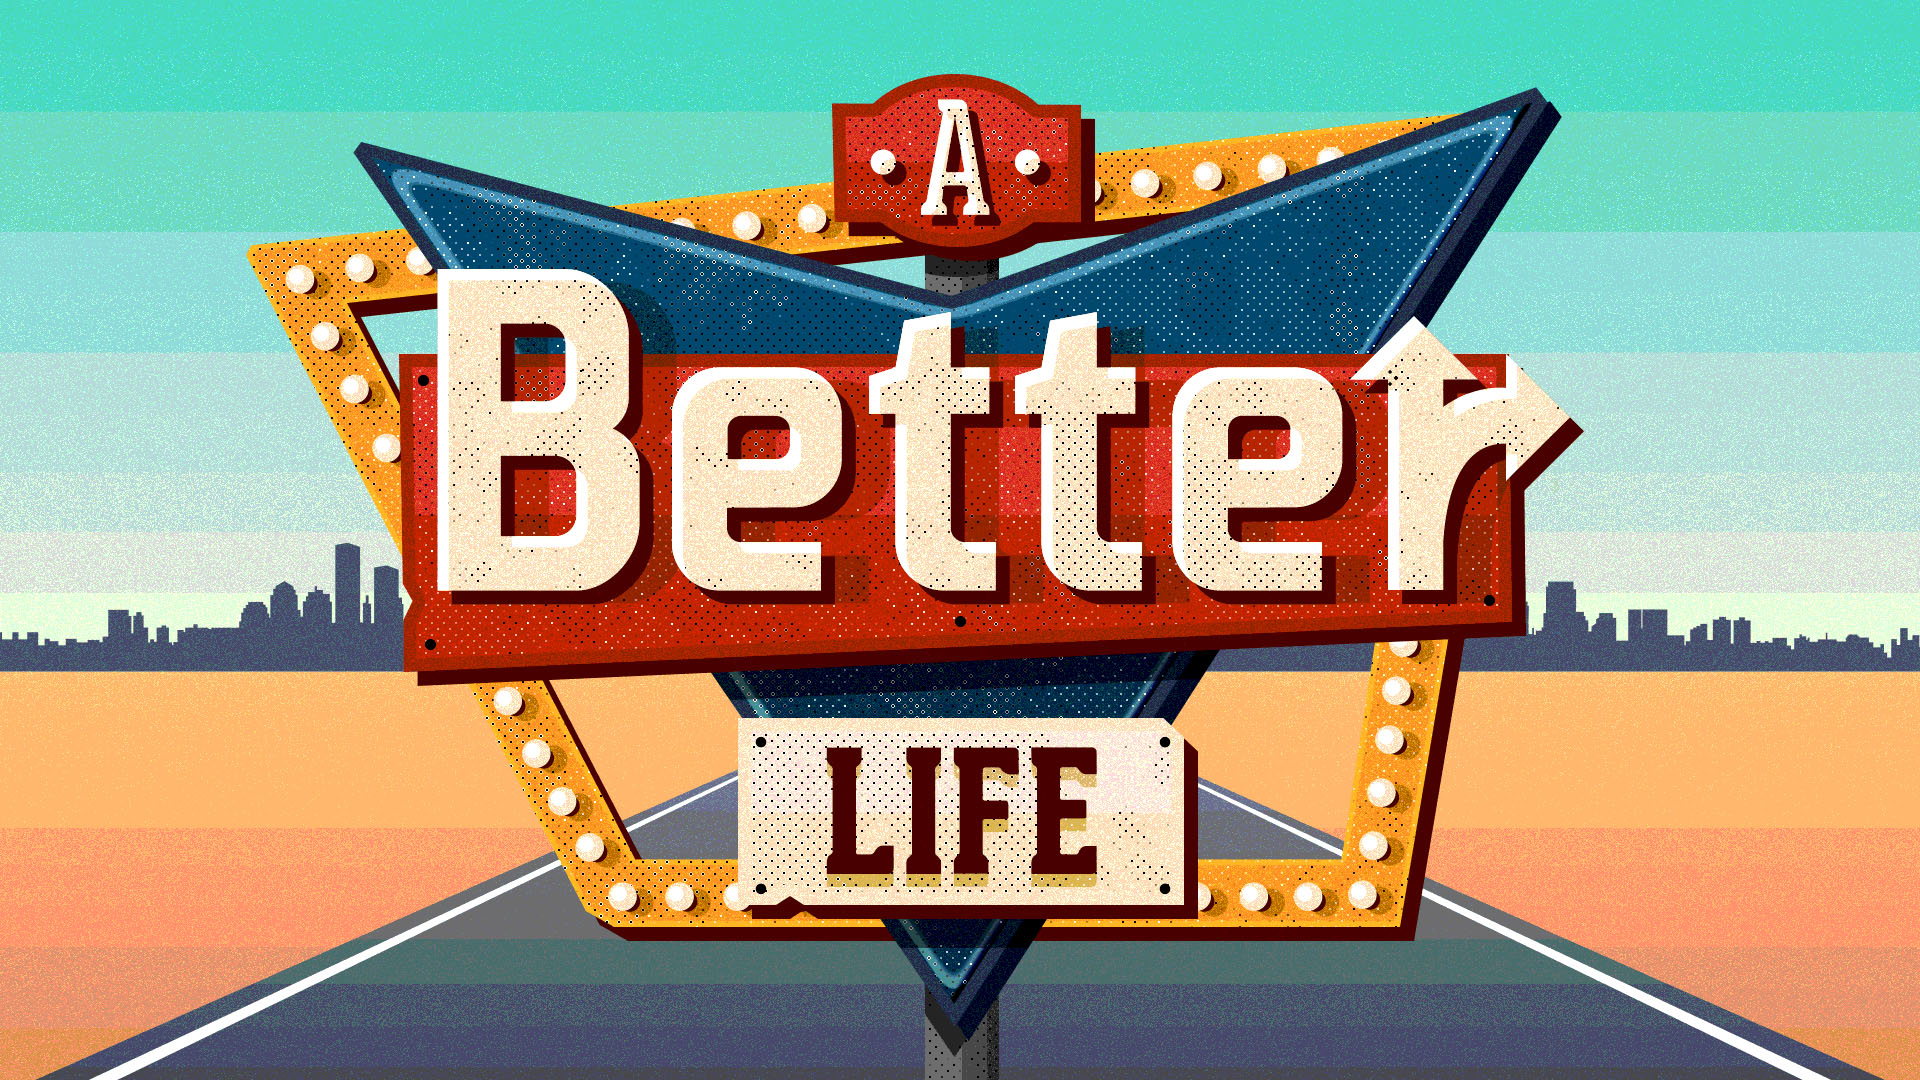 Southeast Christian Church: A Better Life | Shane Harris - Melbourne Florida Graphic Design